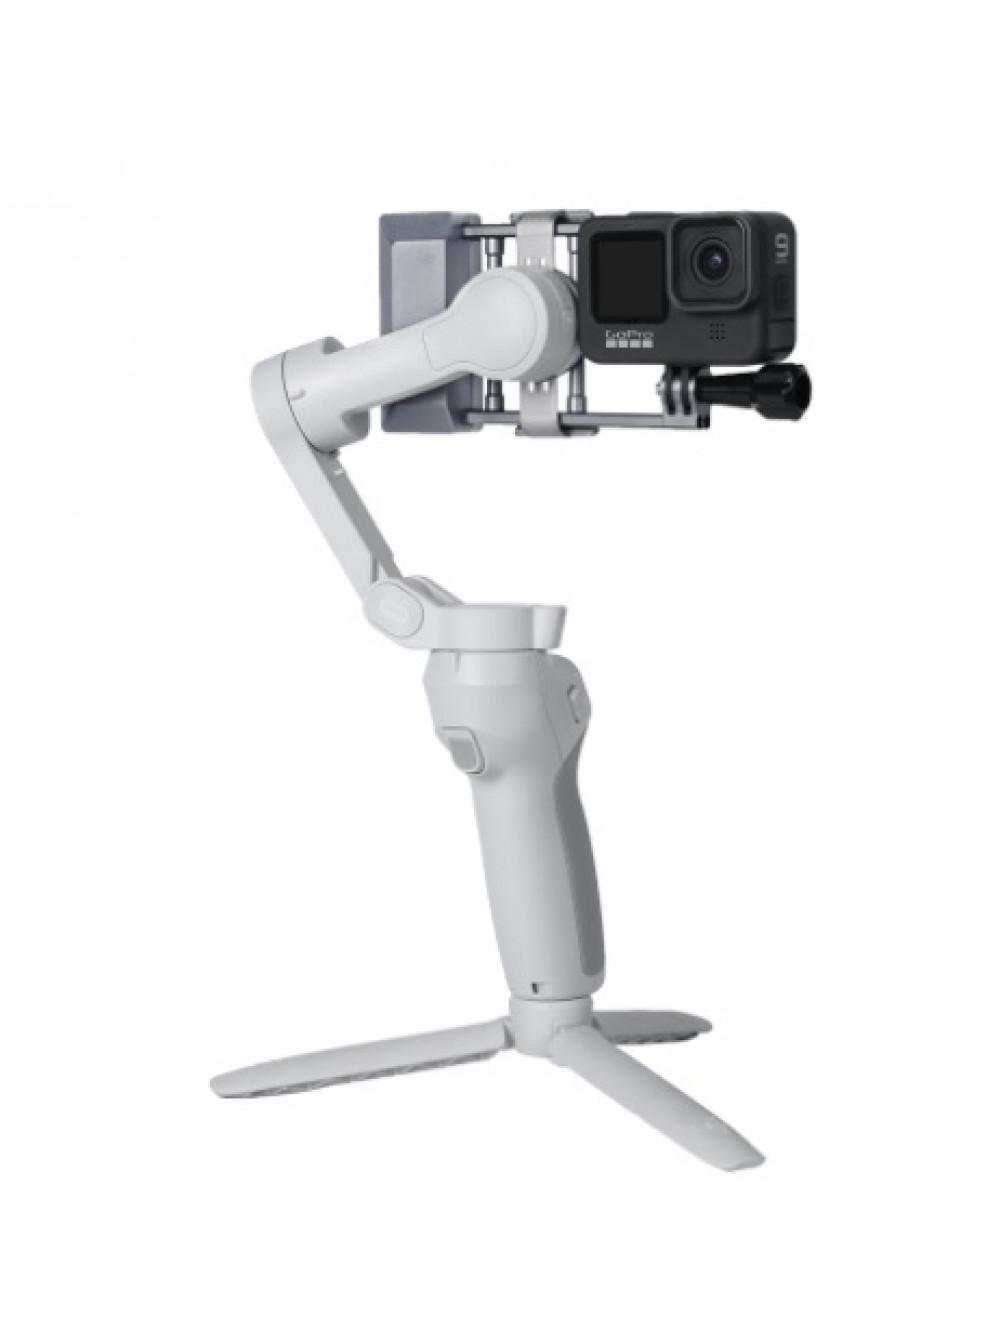 Адаптер экшн камеры к стабилизатору для смартфона Sunnylife (OM4-Q9417)